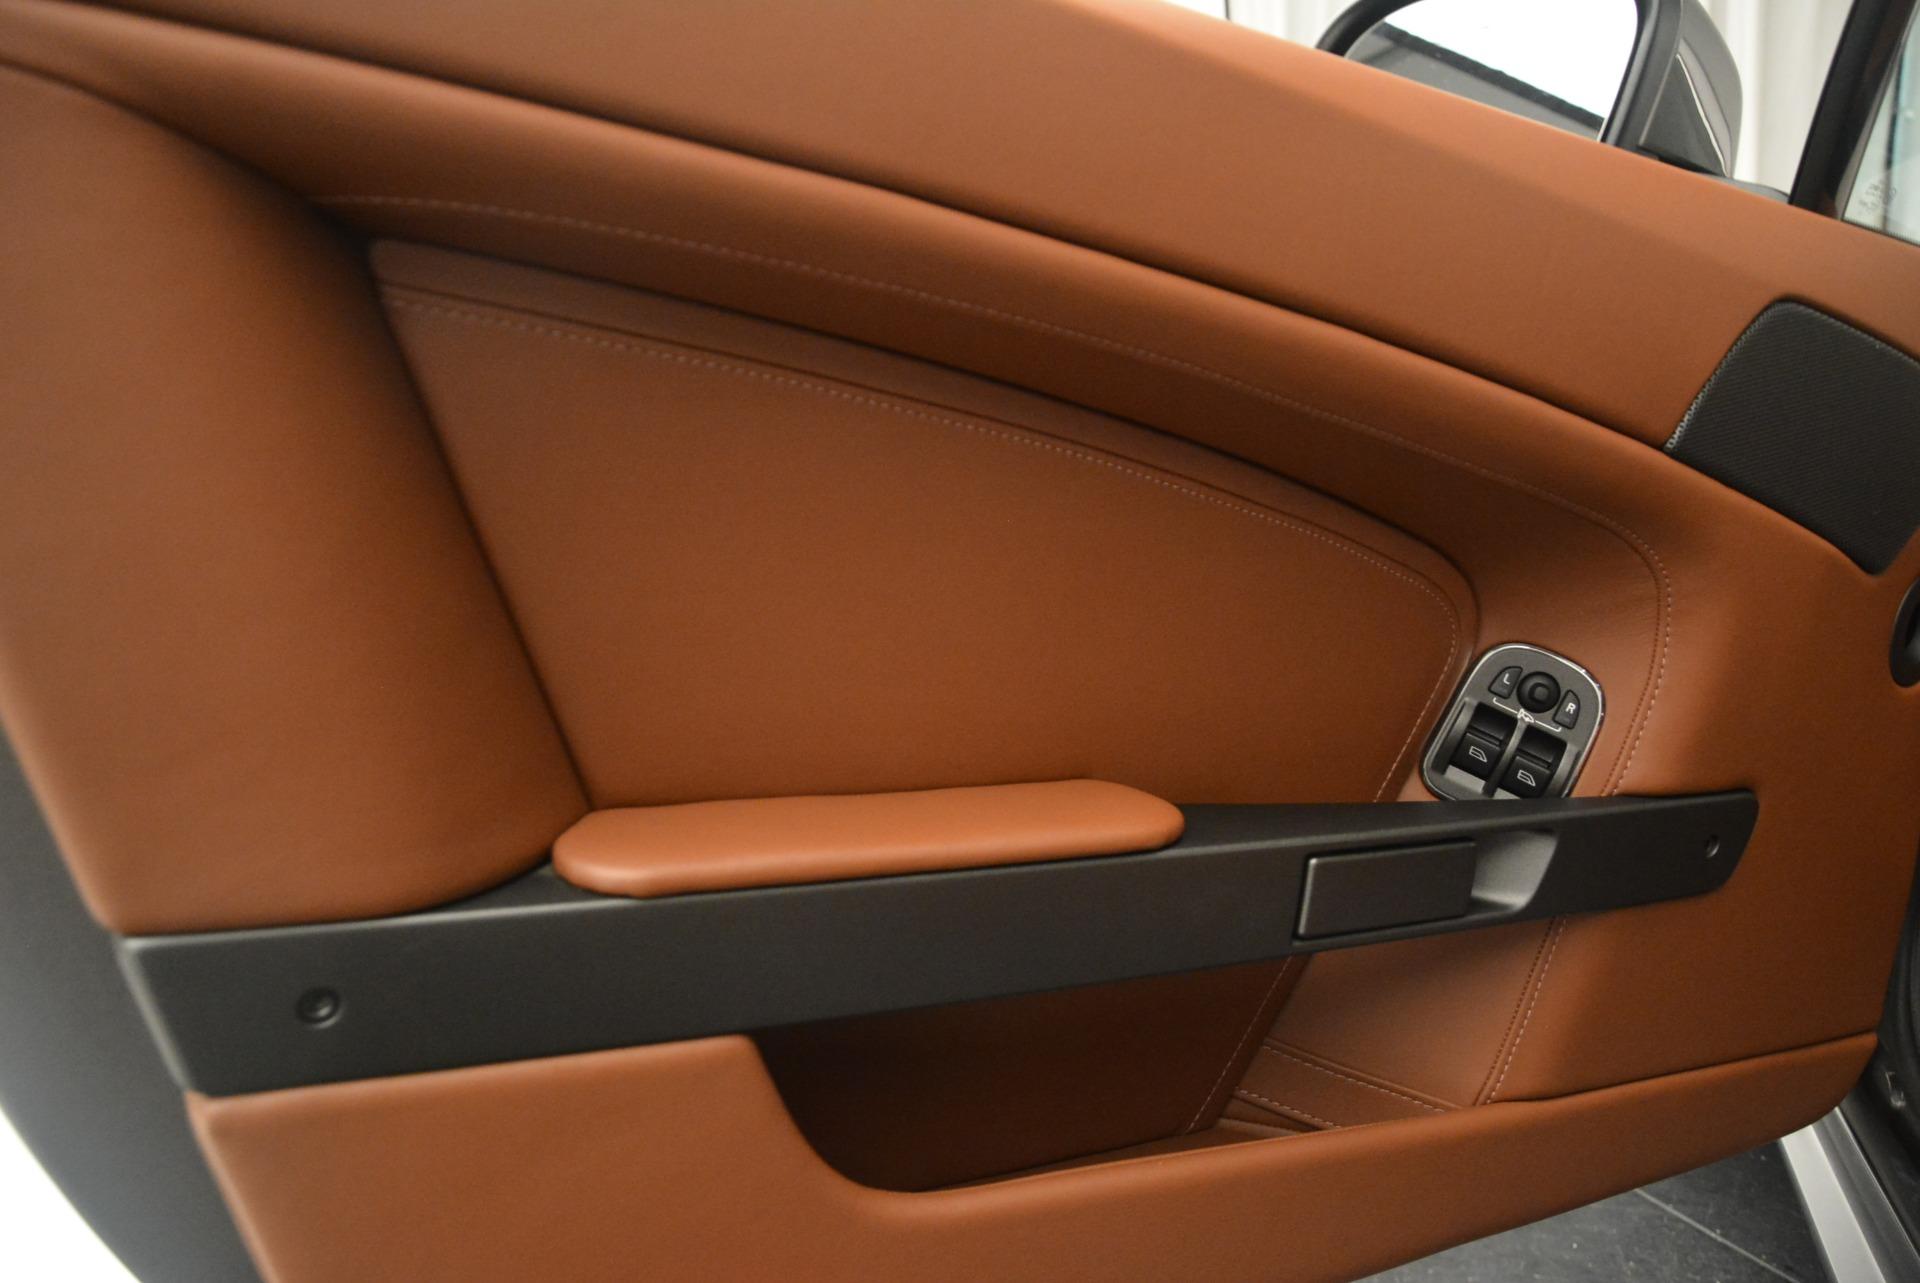 Used 2015 Aston Martin V8 Vantage Roadster For Sale In Greenwich, CT. Alfa Romeo of Greenwich, 7396 2463_p22